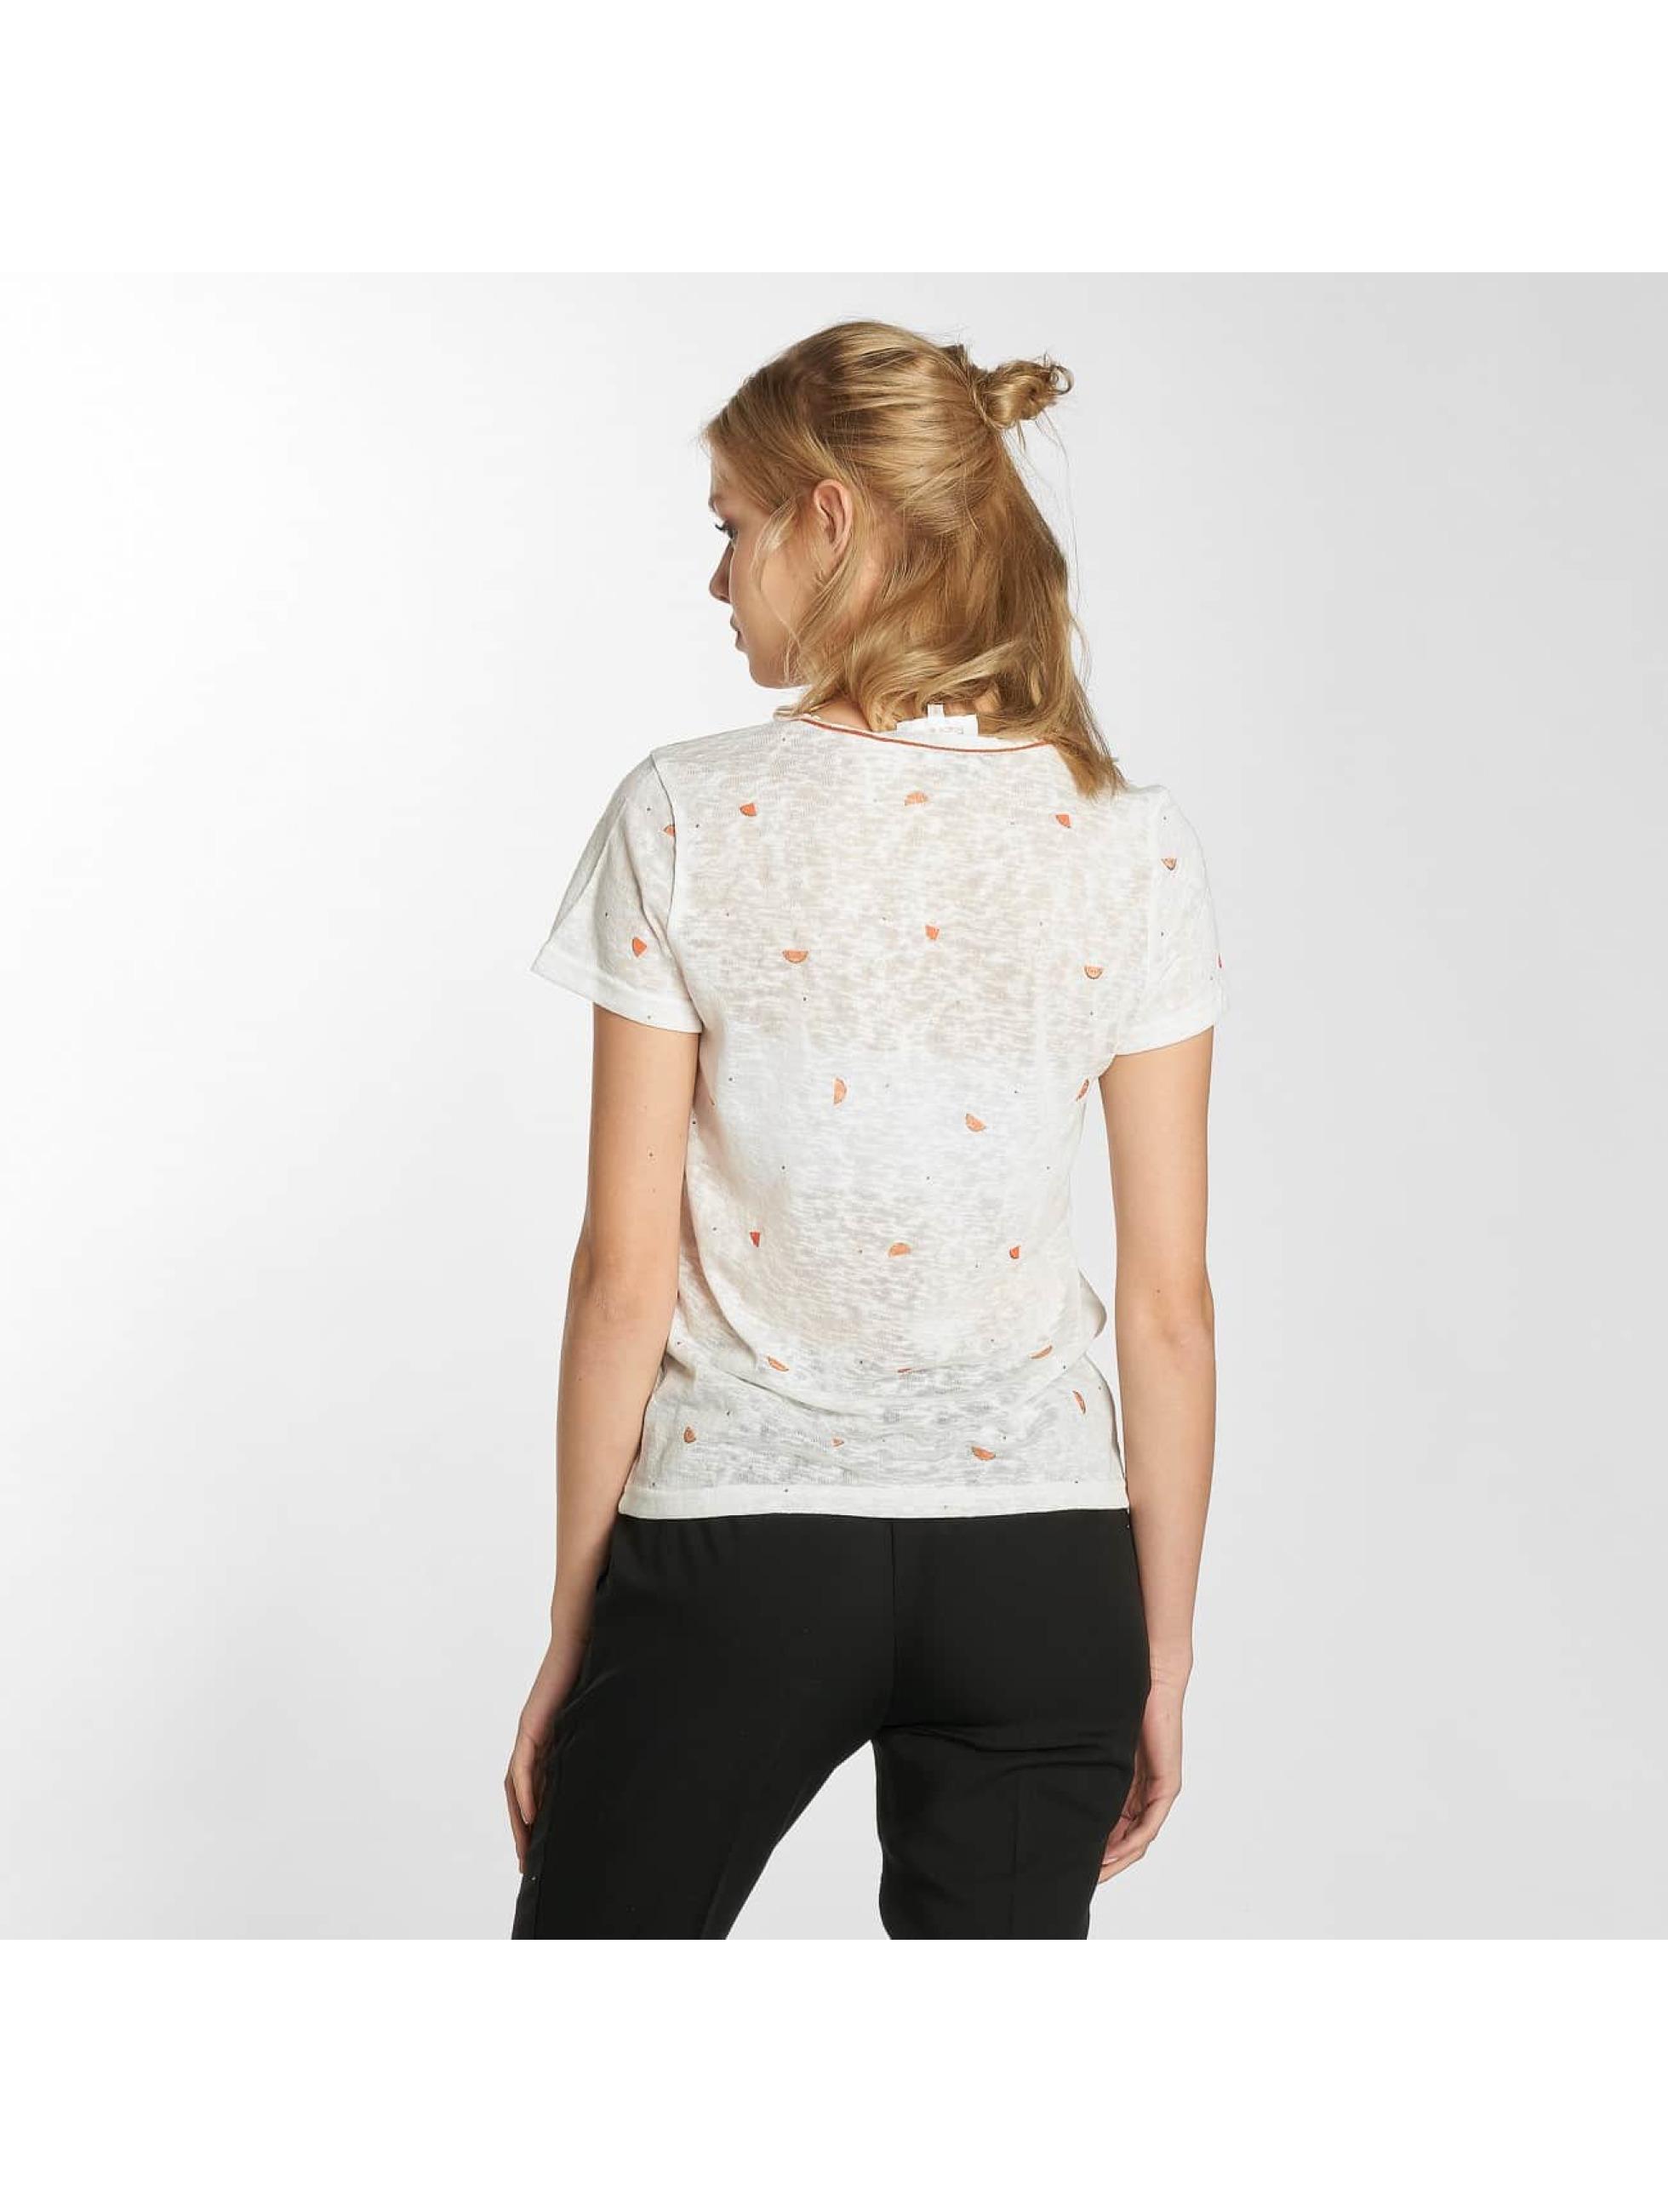 Grace & Mila T-Shirt Paquita white